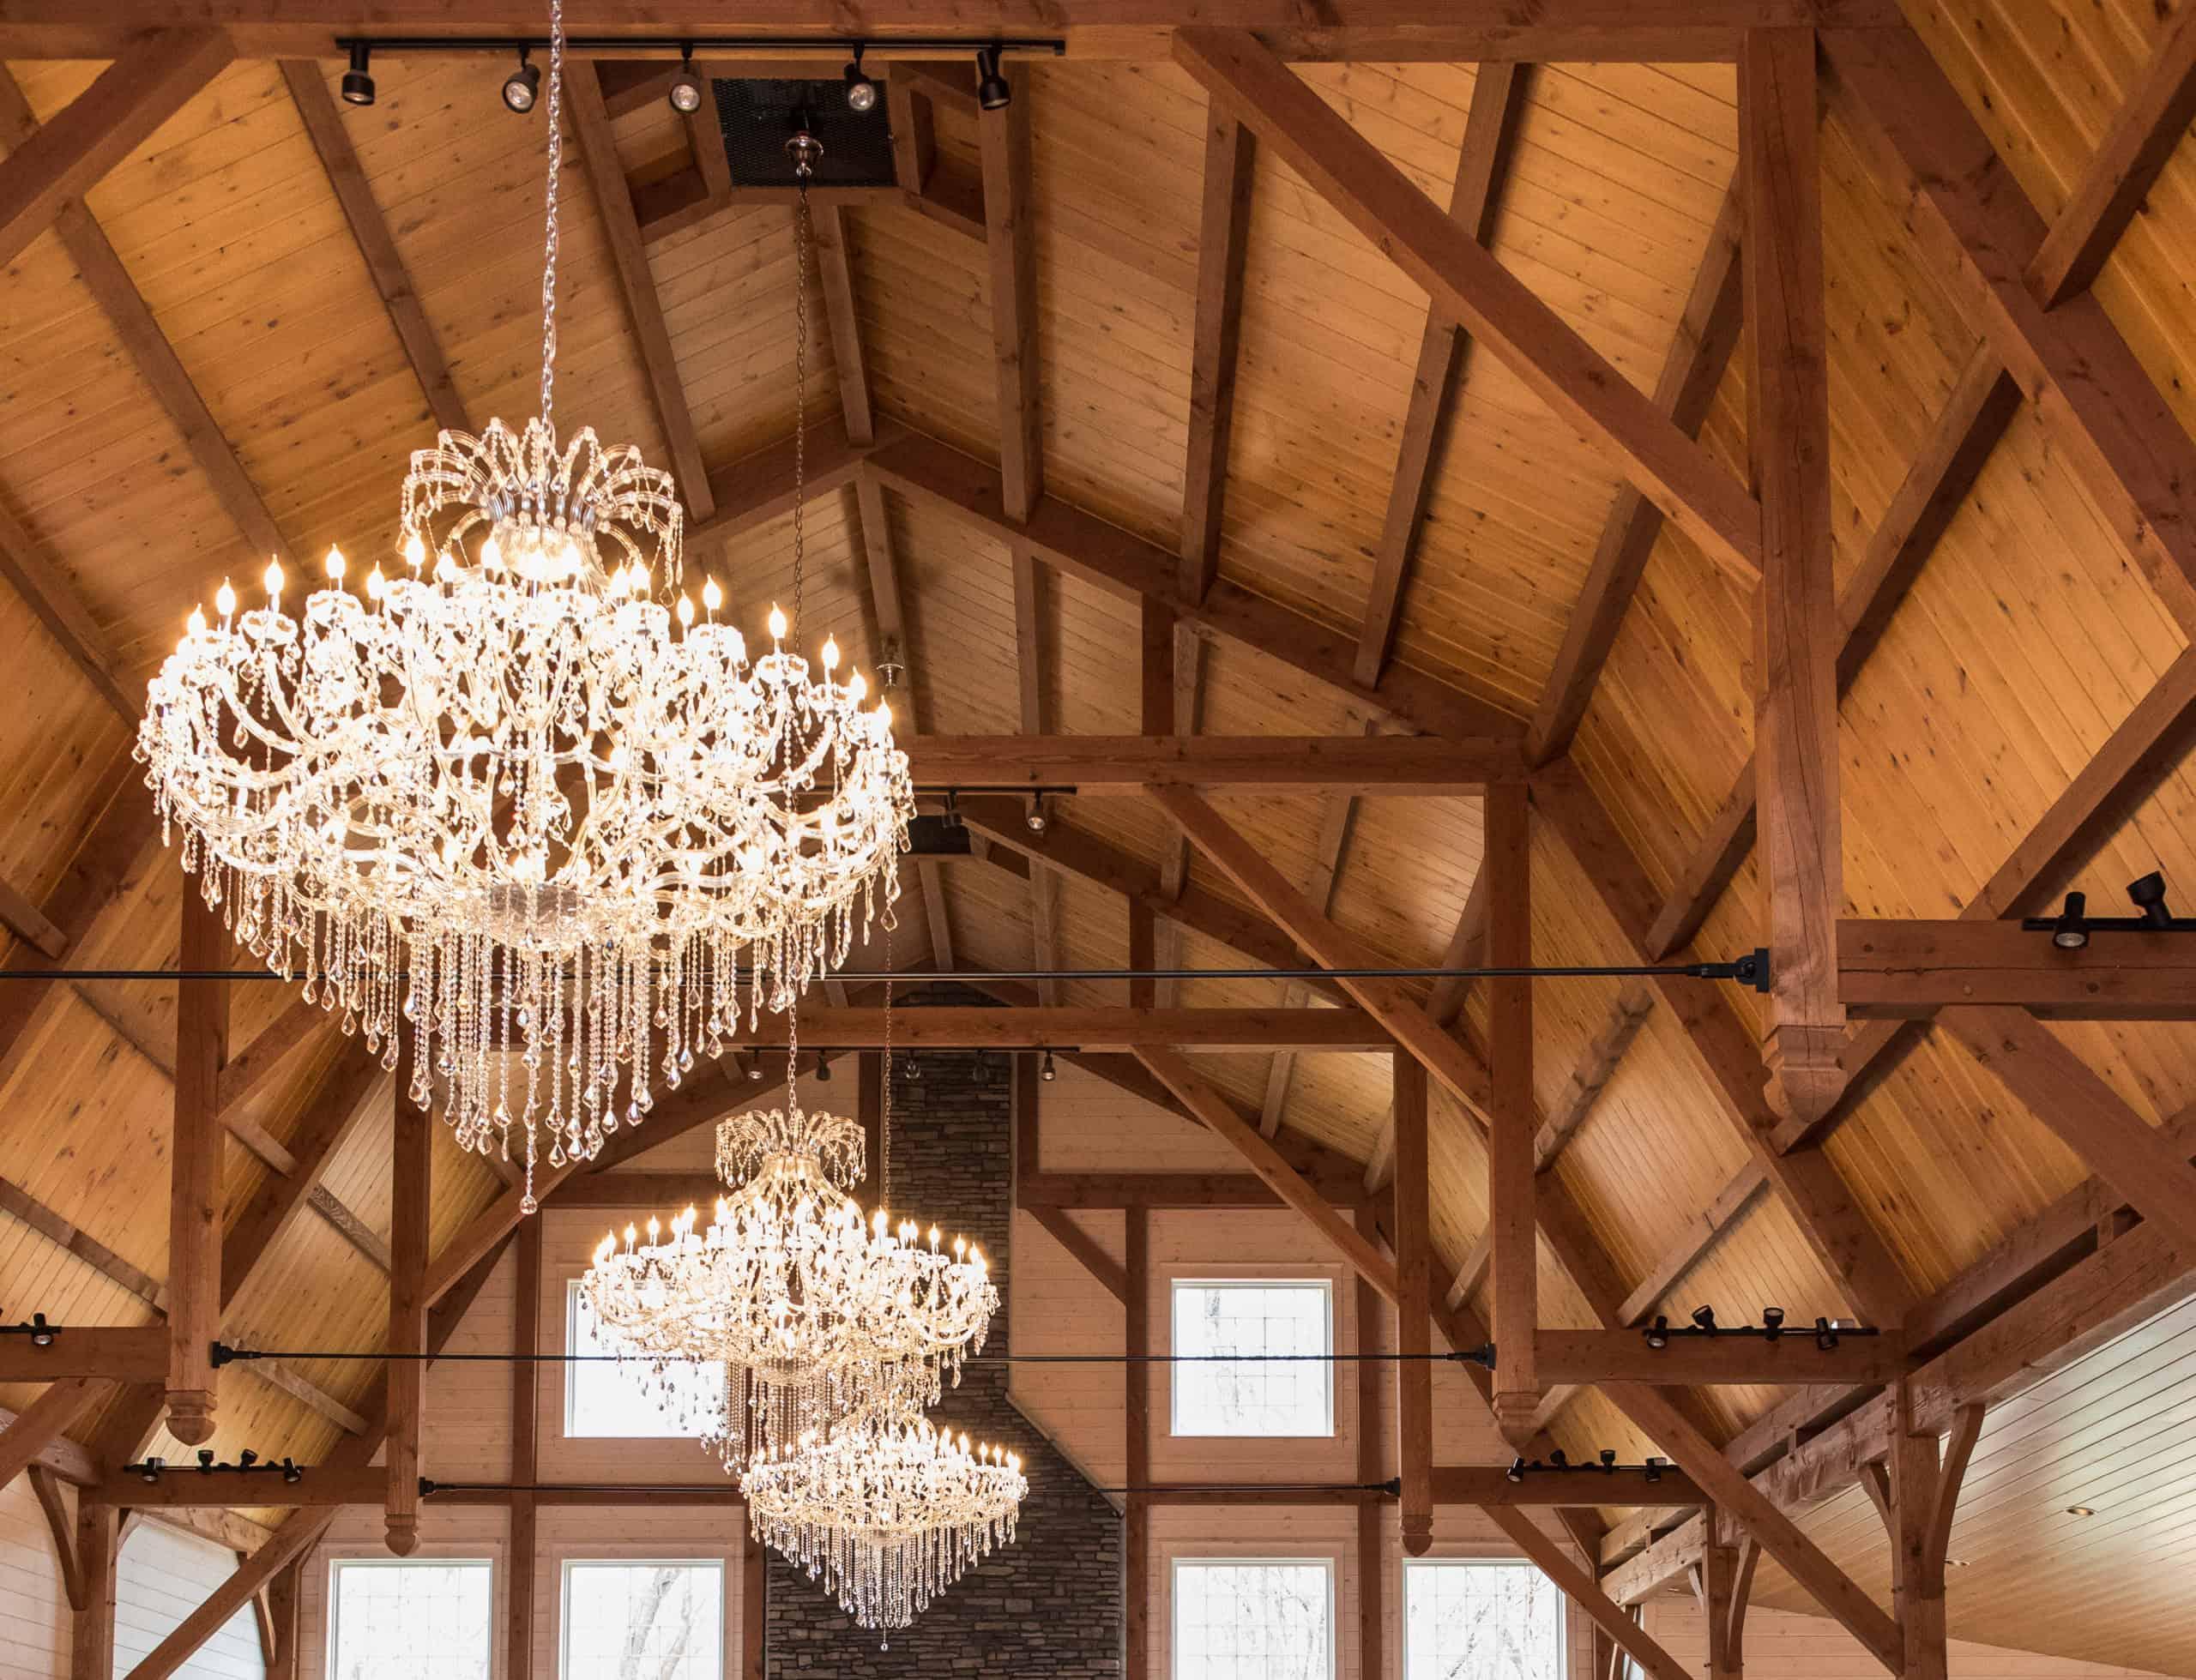 timber frame vaulted ceiling chandelier